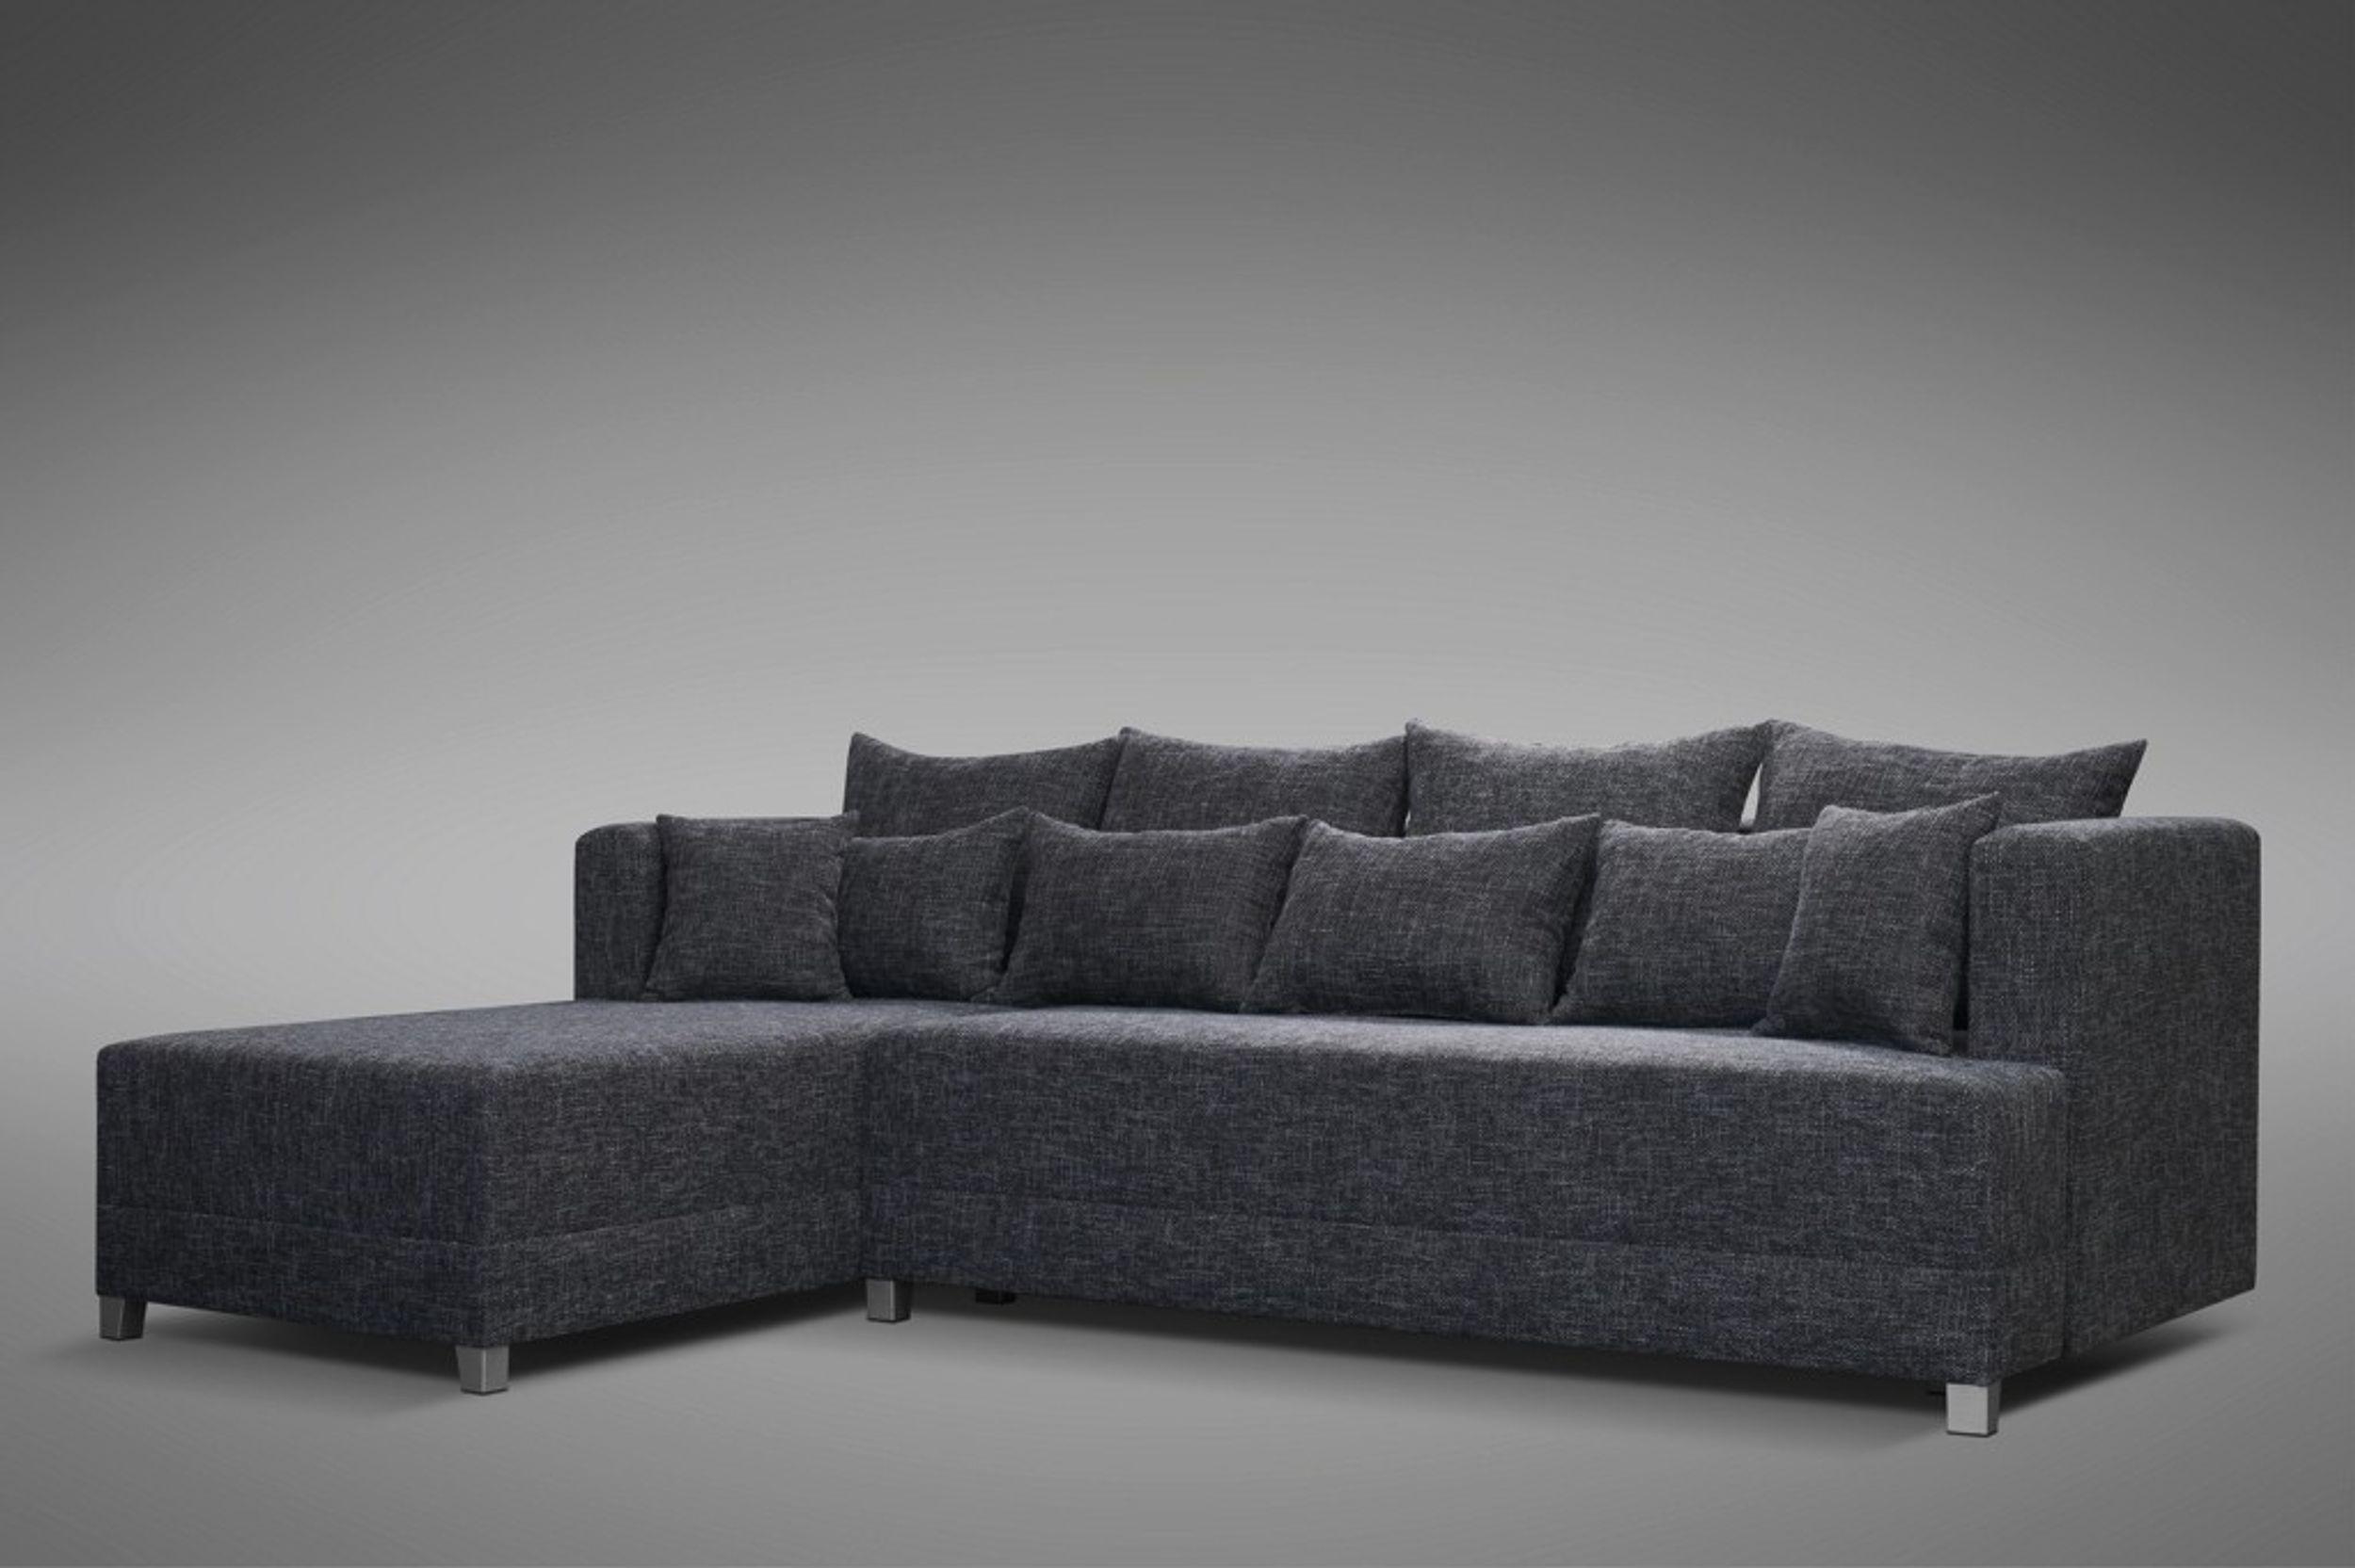 Schlafsofa Sofa Couch Ecksofa Eckcouch In Grau Mit Schlaffunktion